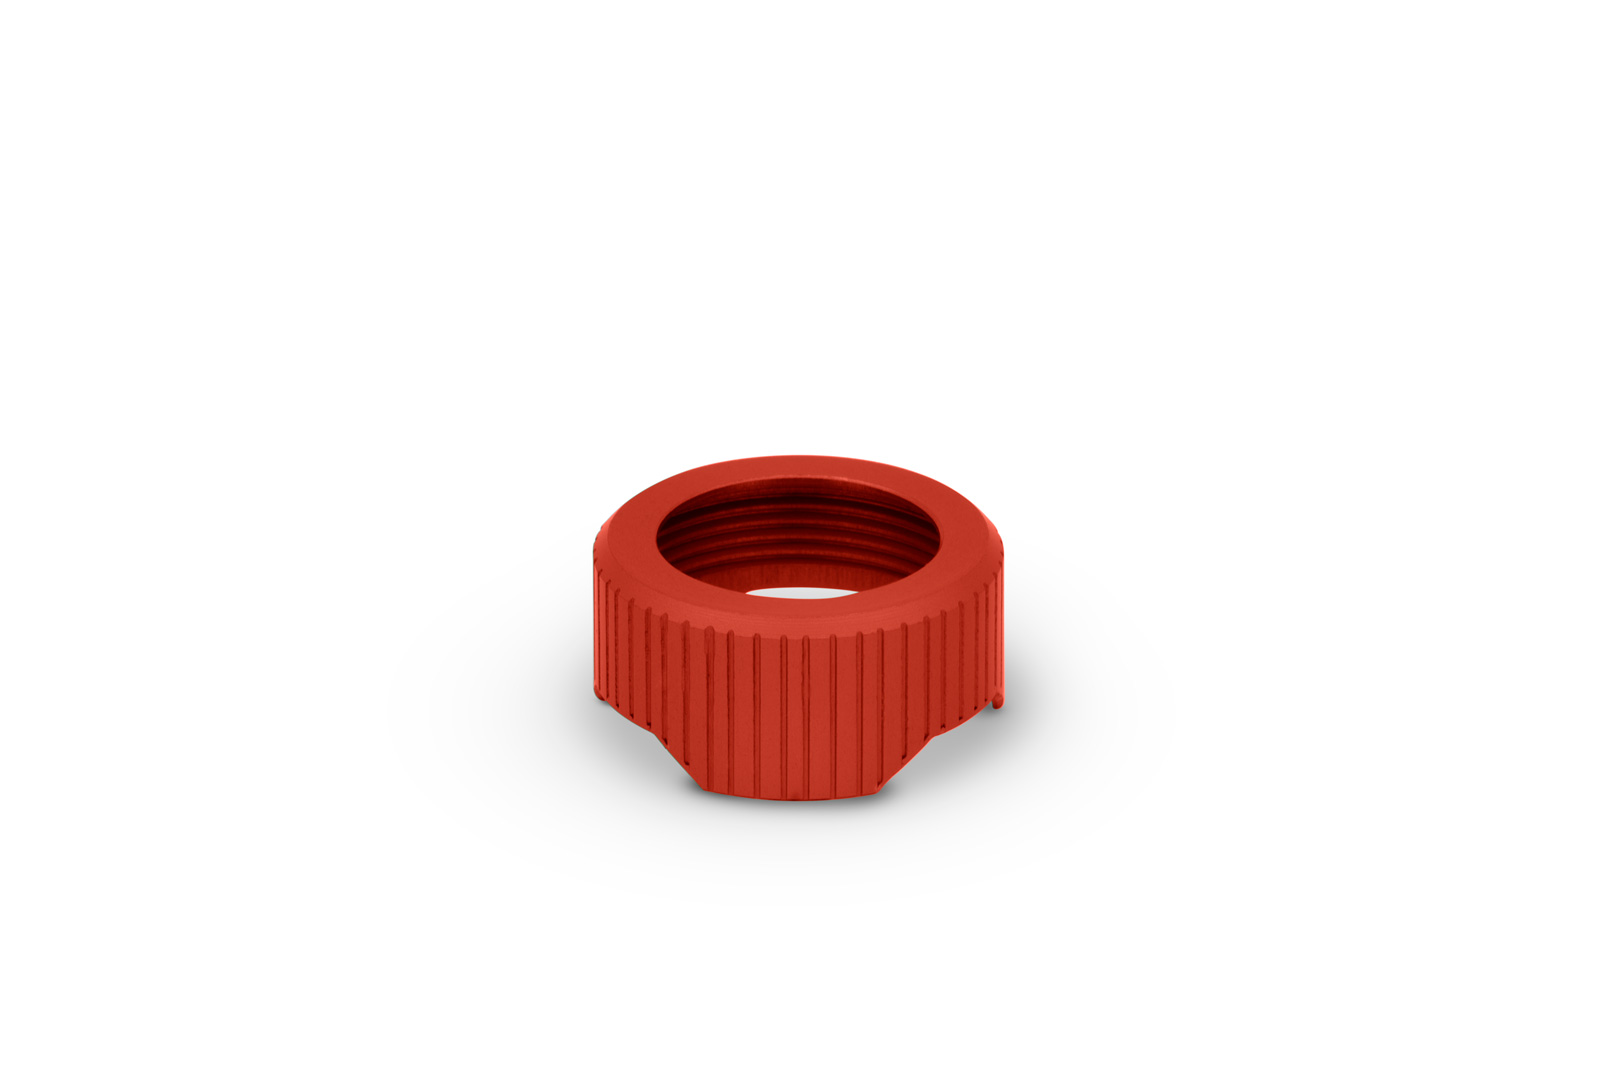 EK-Quantum_Torque_Compression_Ring_6-Pack_HDC_16-Red_TOP